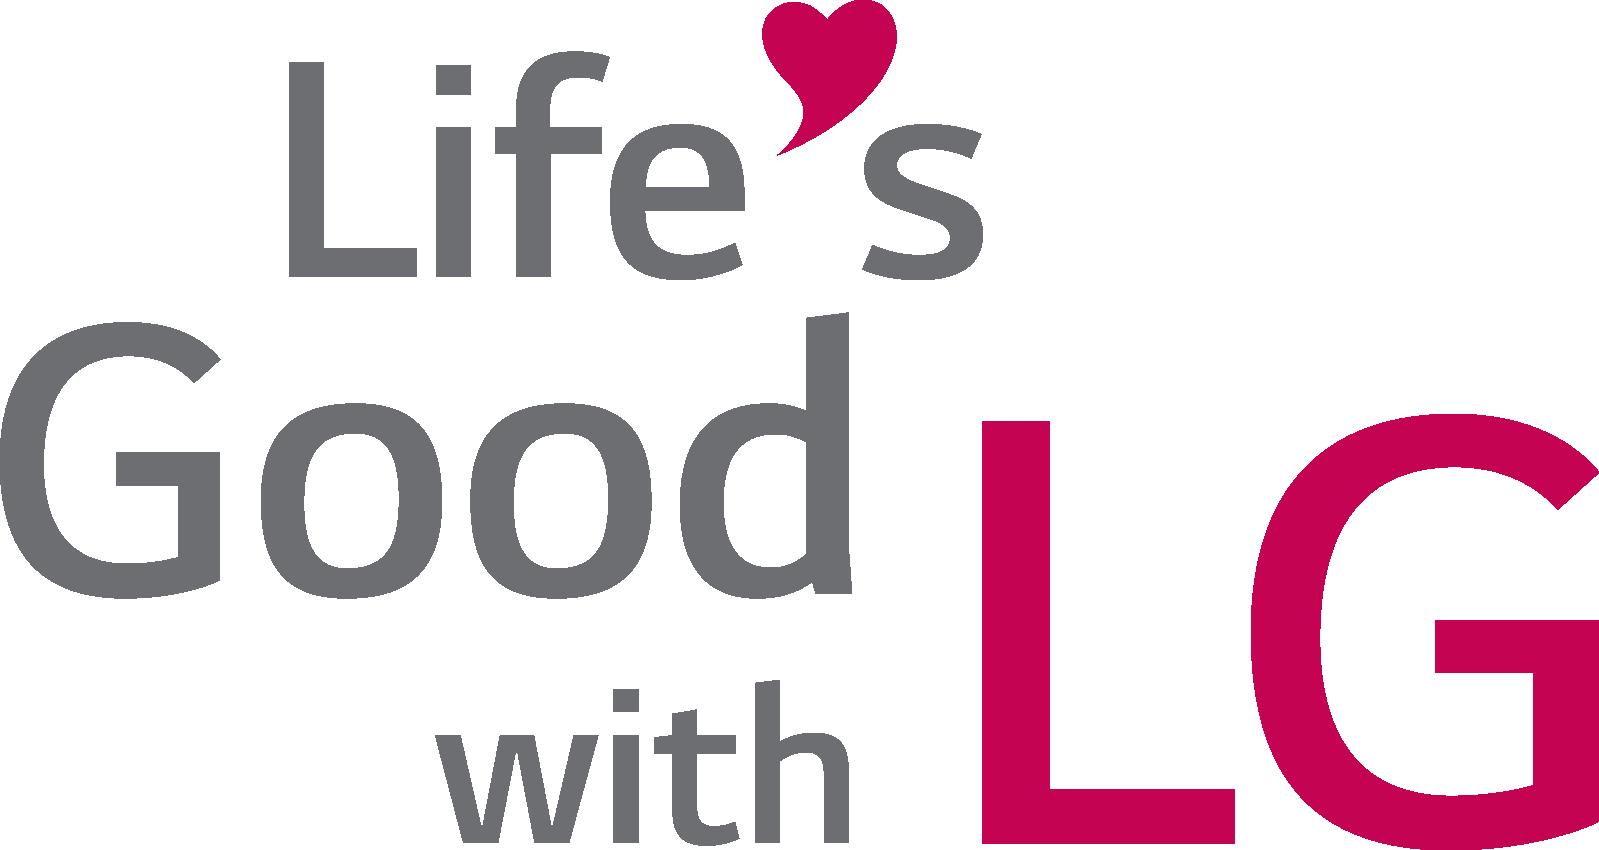 LG CSR 활동 슬로건인 'Life's good with LG' 문구가 보이는 LG CSR 로고 이미지